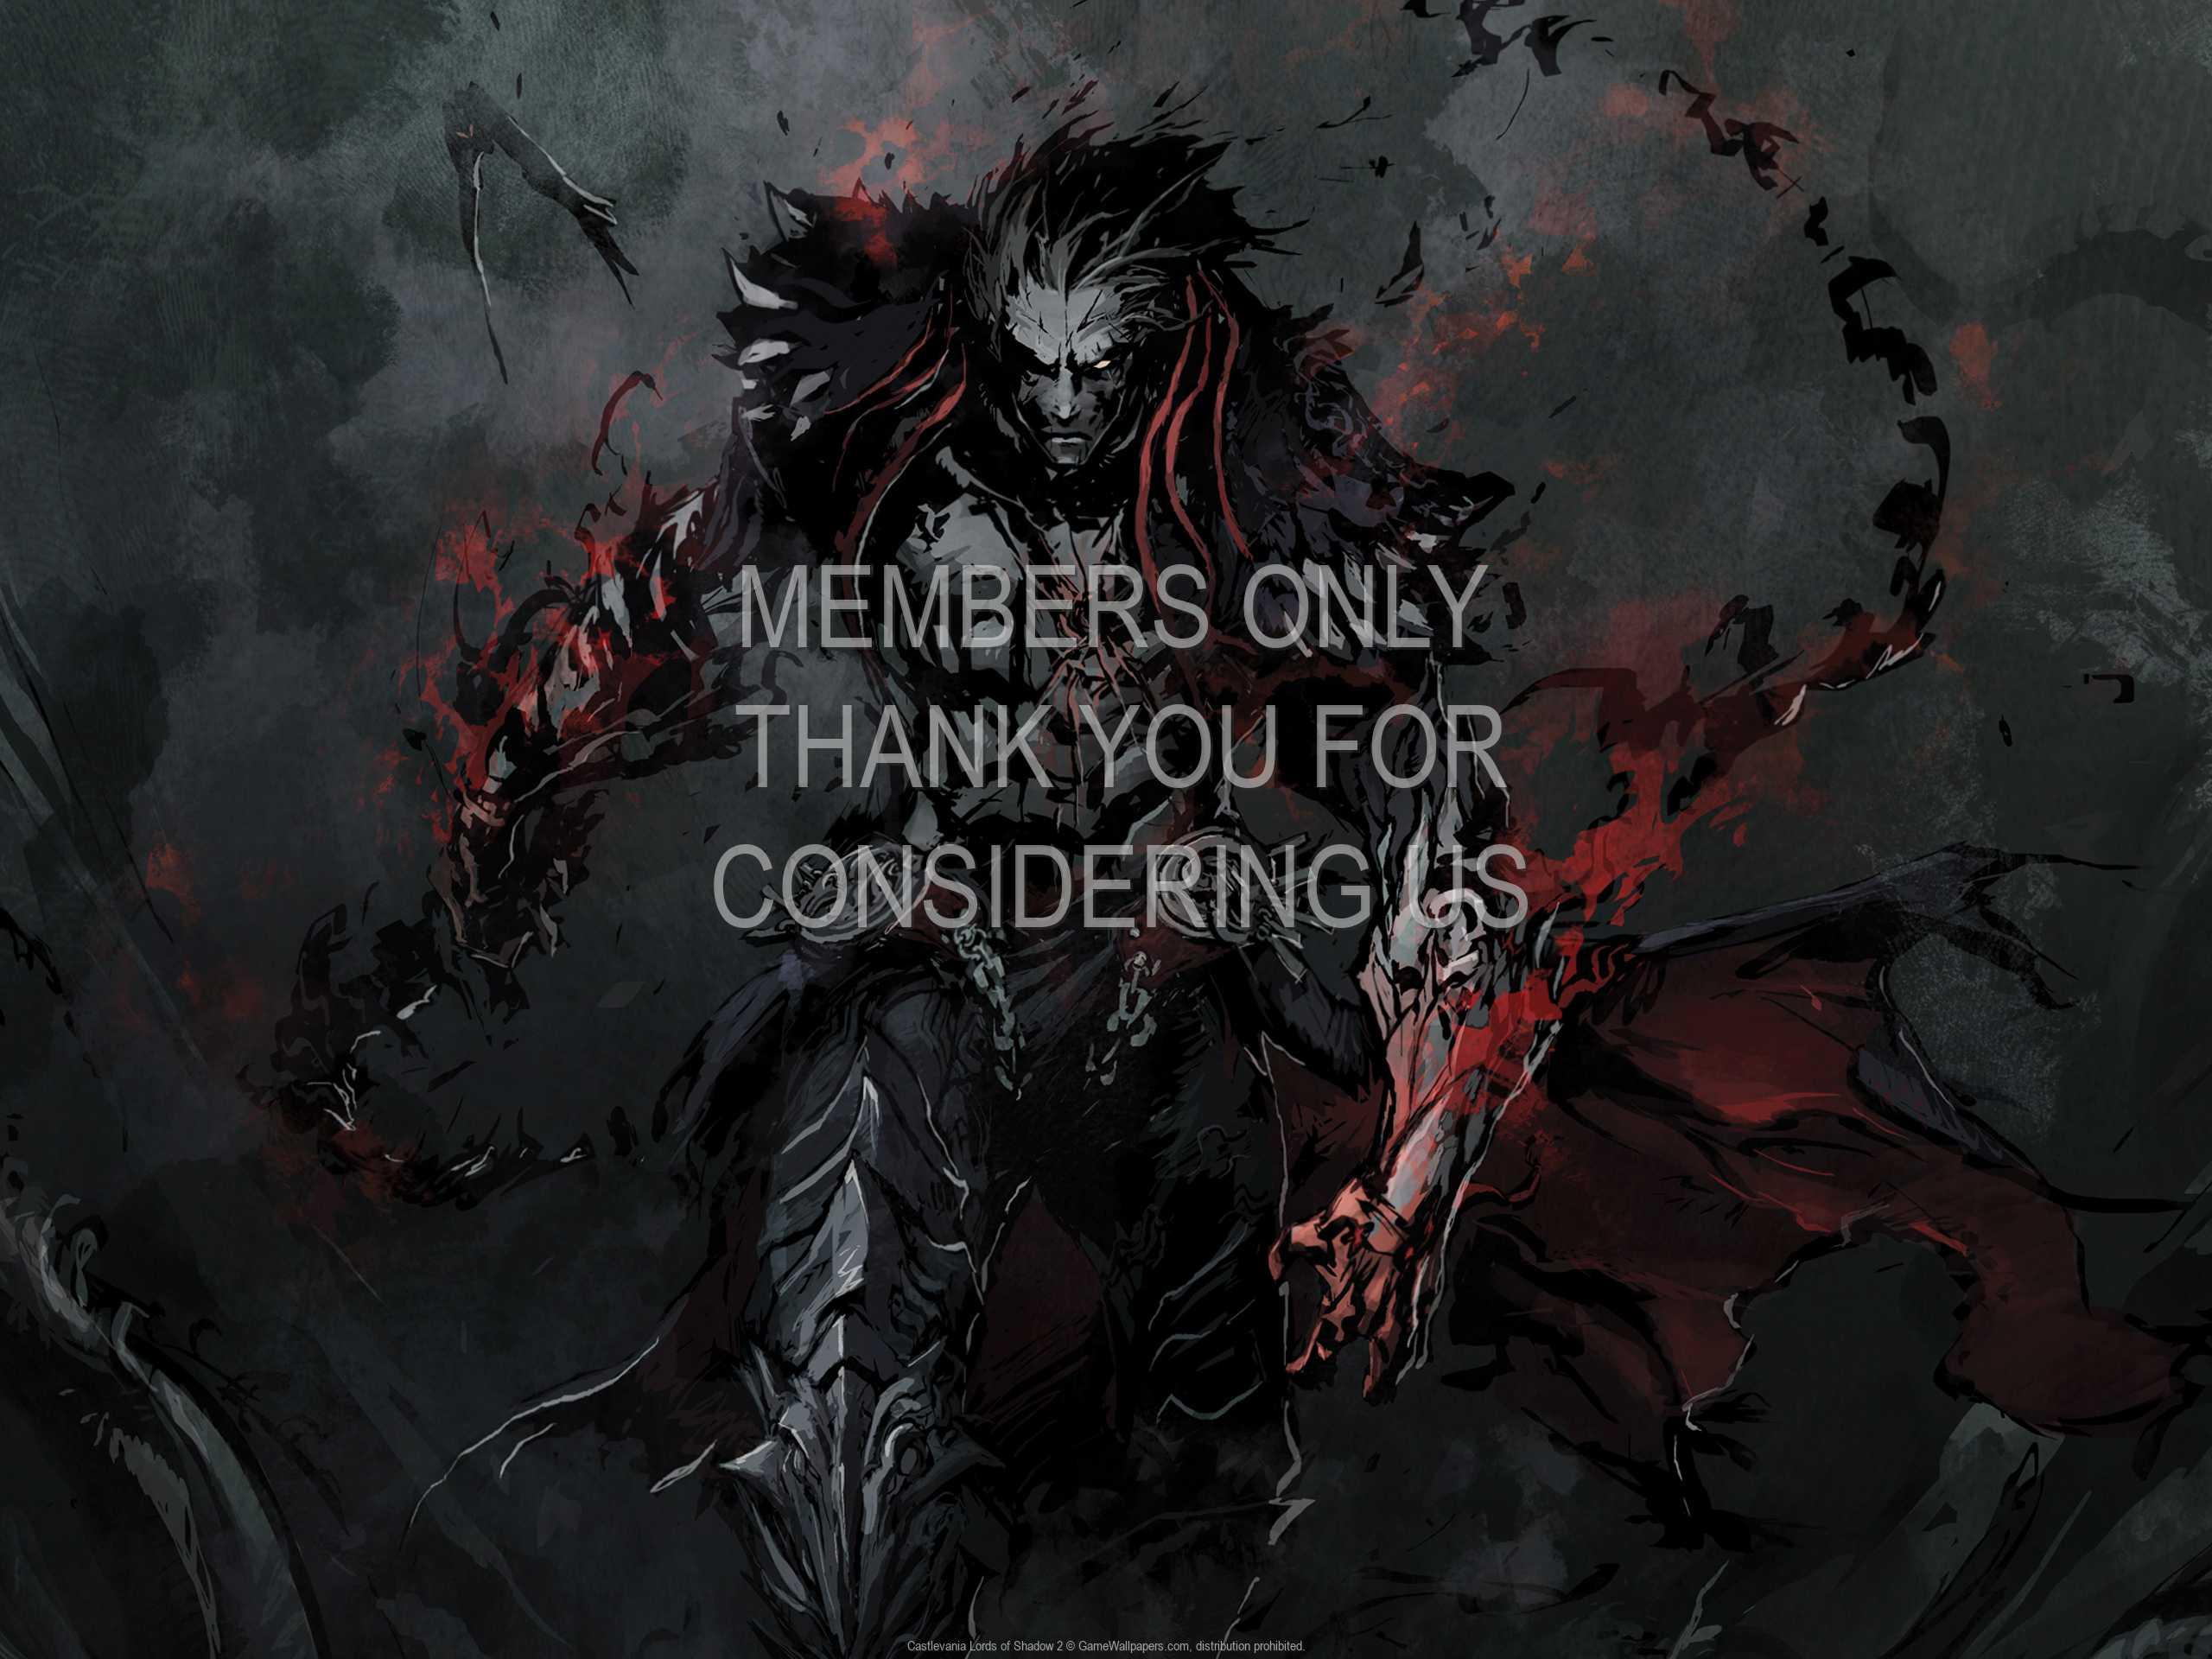 Castlevania: Lords of Shadow 2 1080p Horizontal Handy Hintergrundbild 02